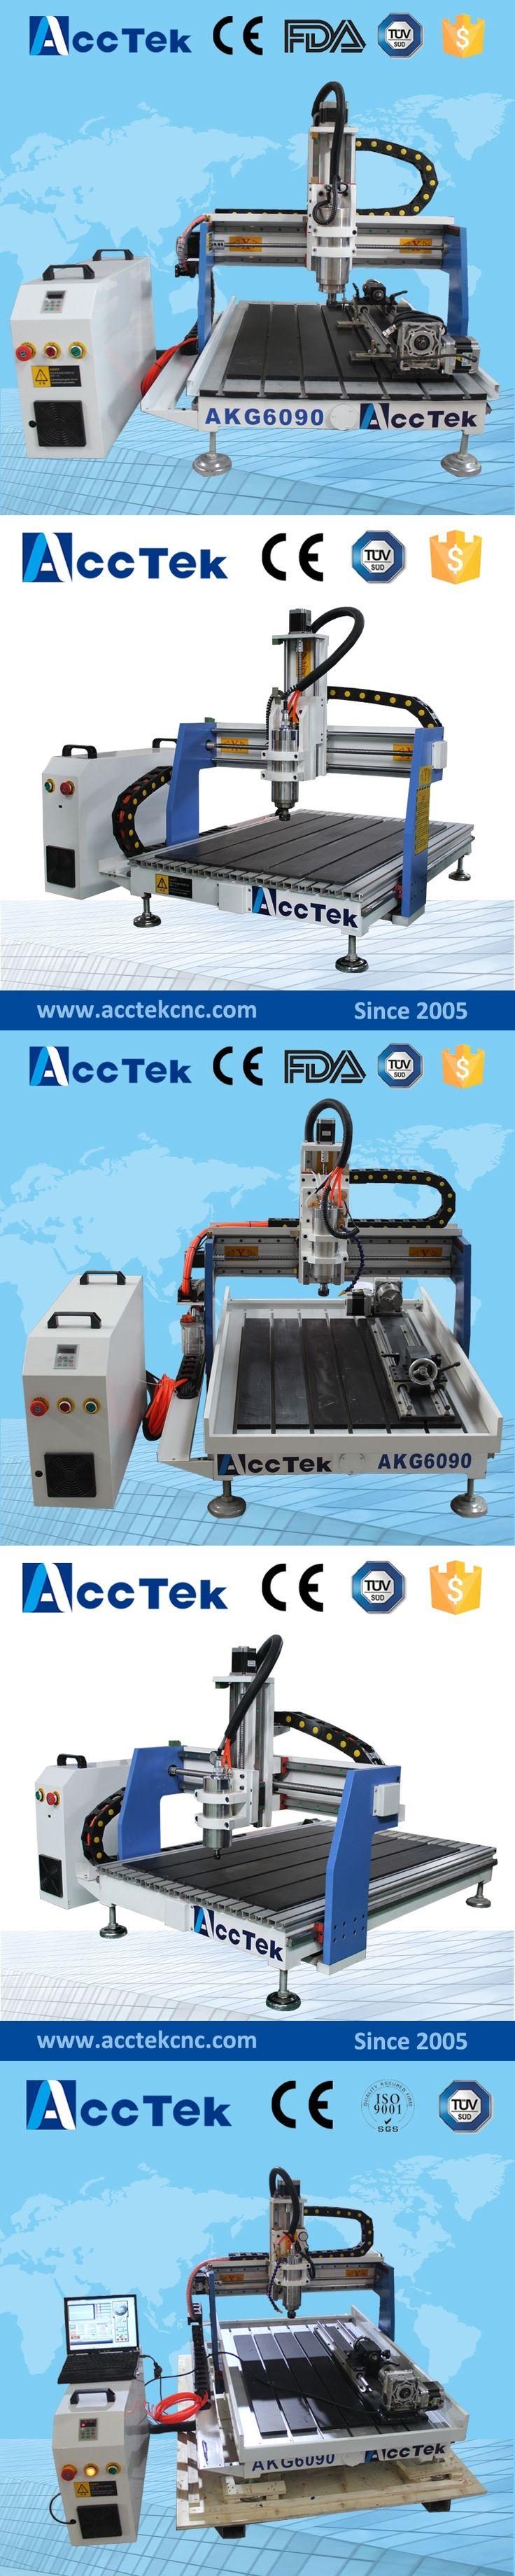 Acctek hot sale cnc router machine AKG6090/6012/6040 mini wood metal cnc milling engraving machine